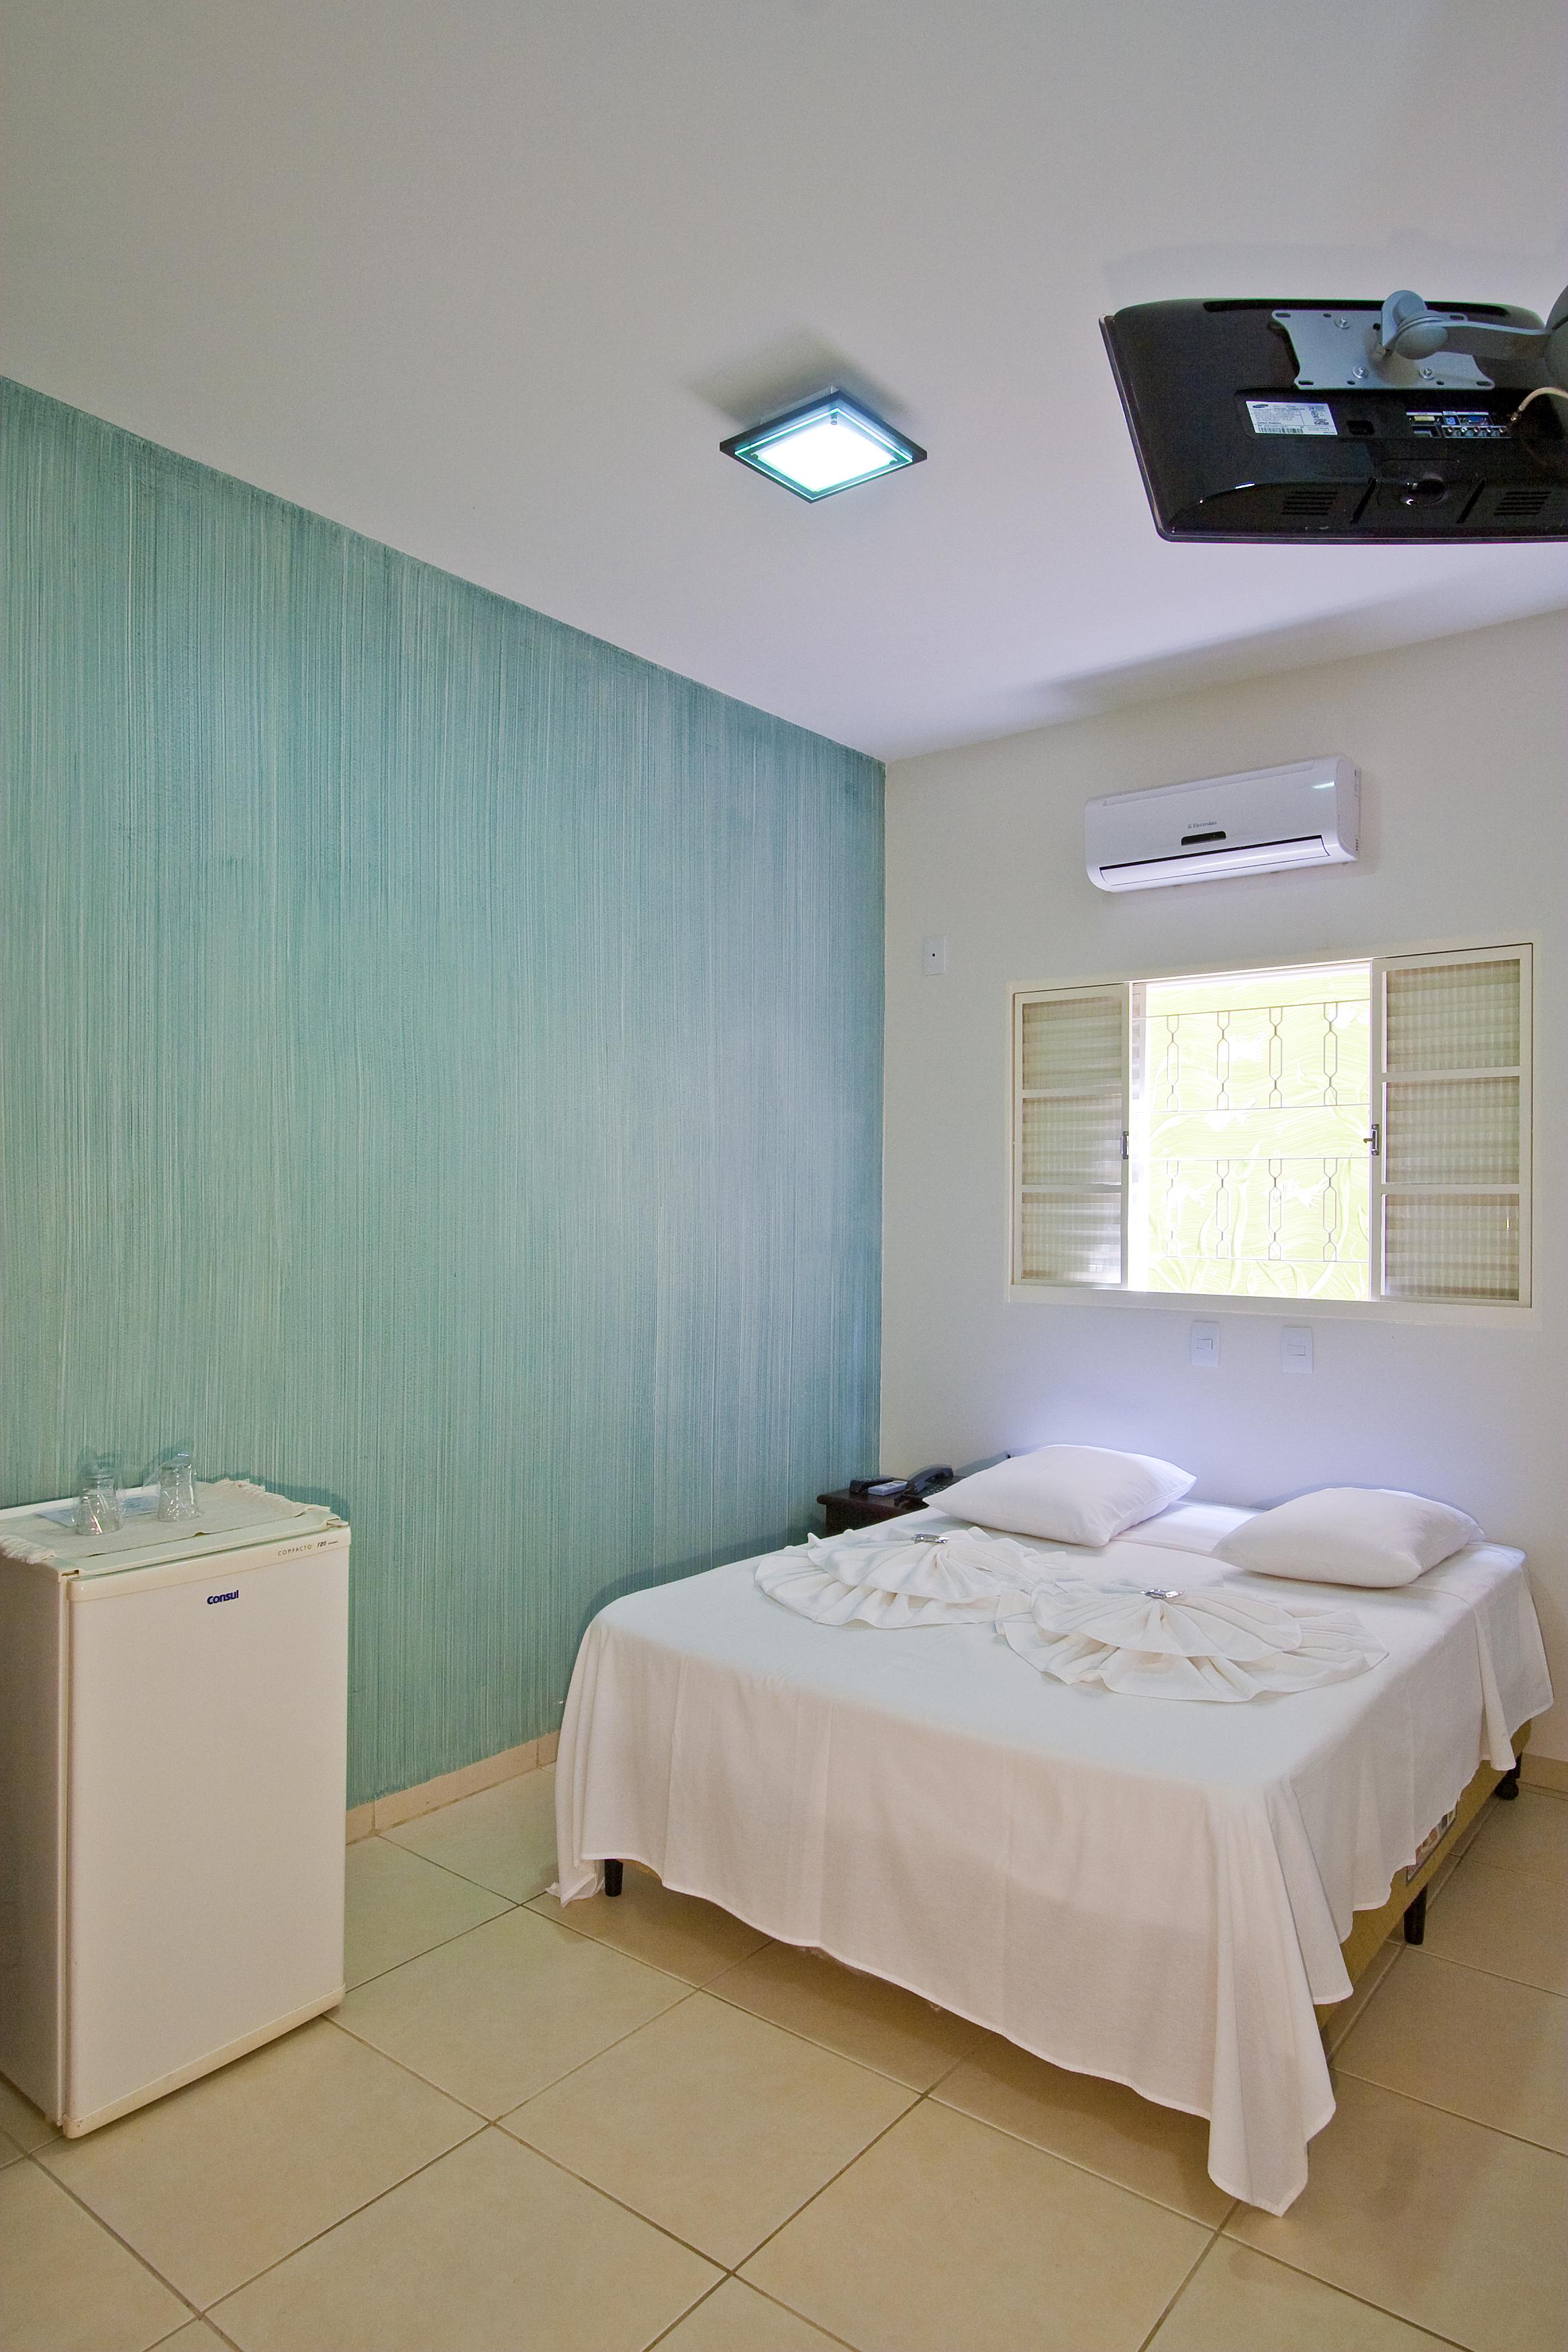 pousada_calliandra_apartamentos_20101223_0015.jpg